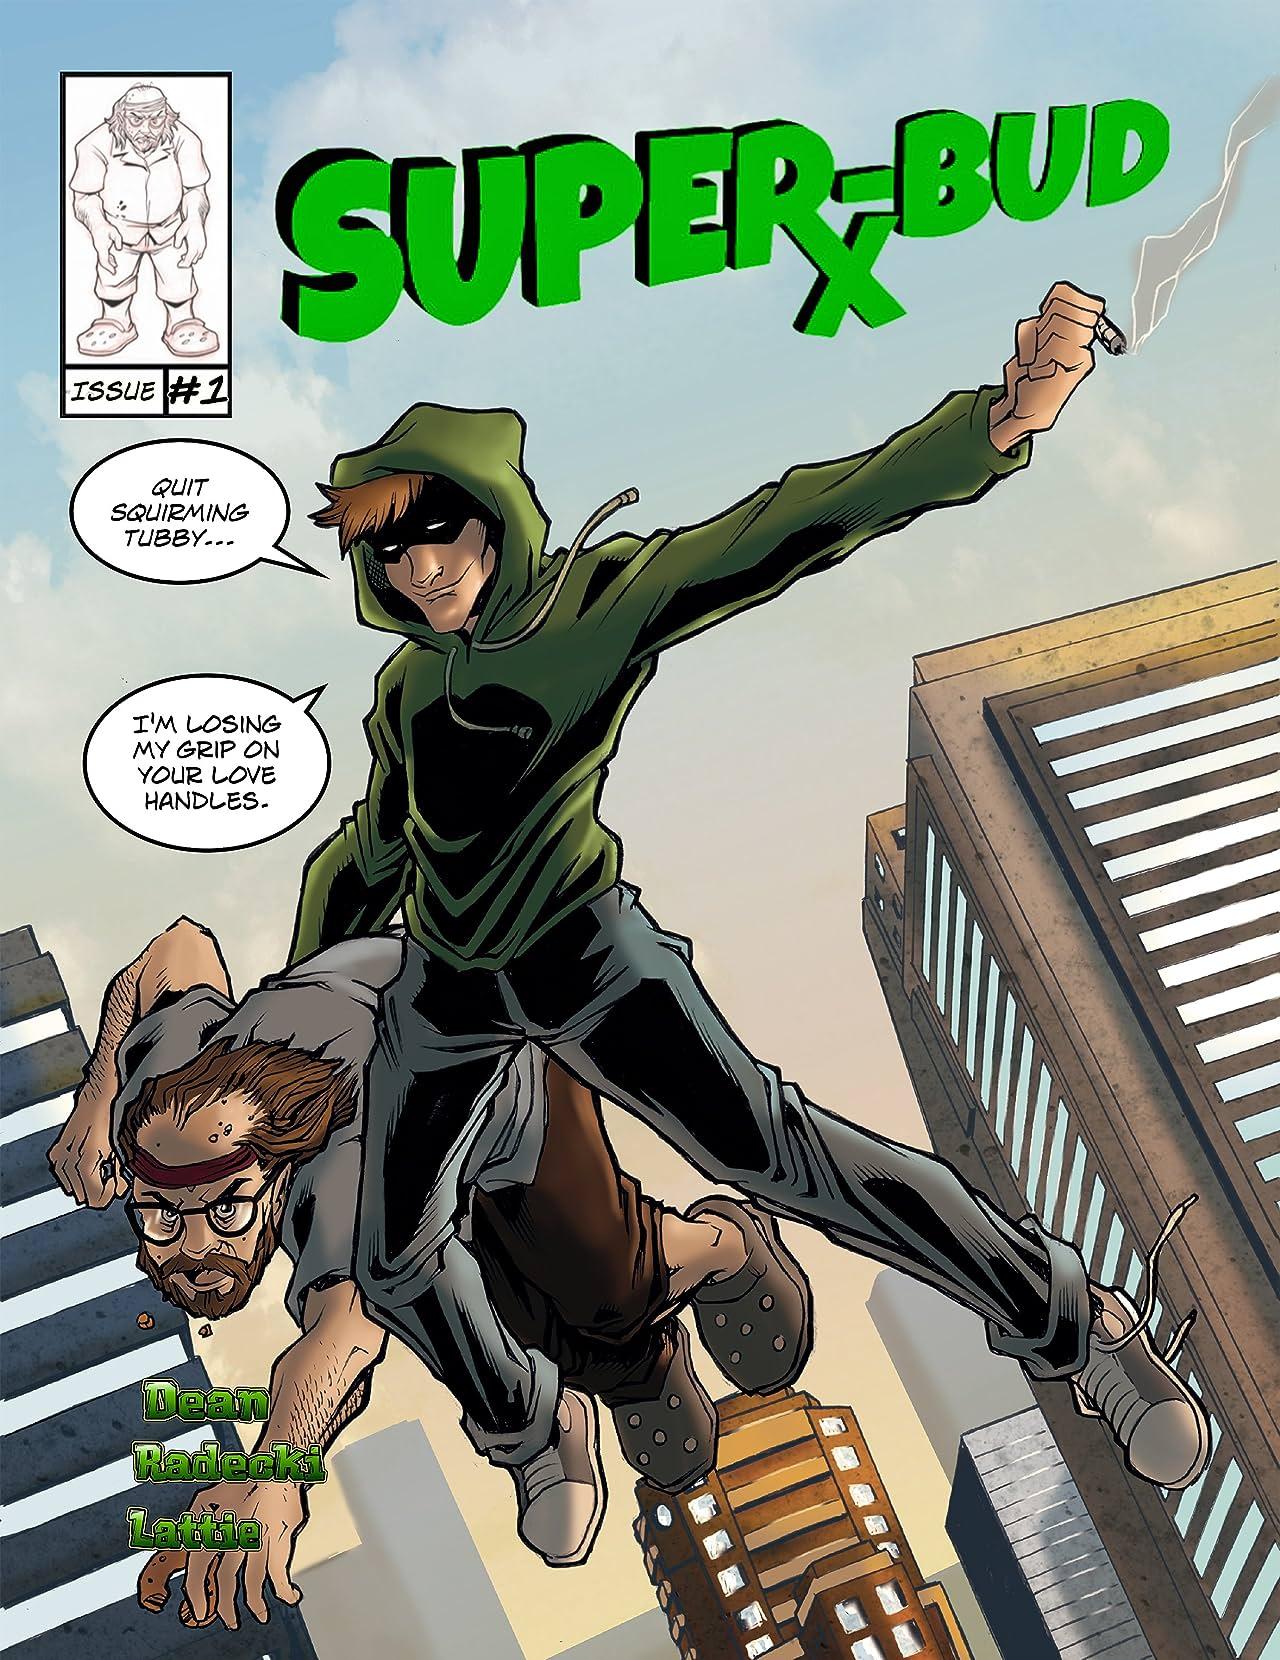 SuperBud #1